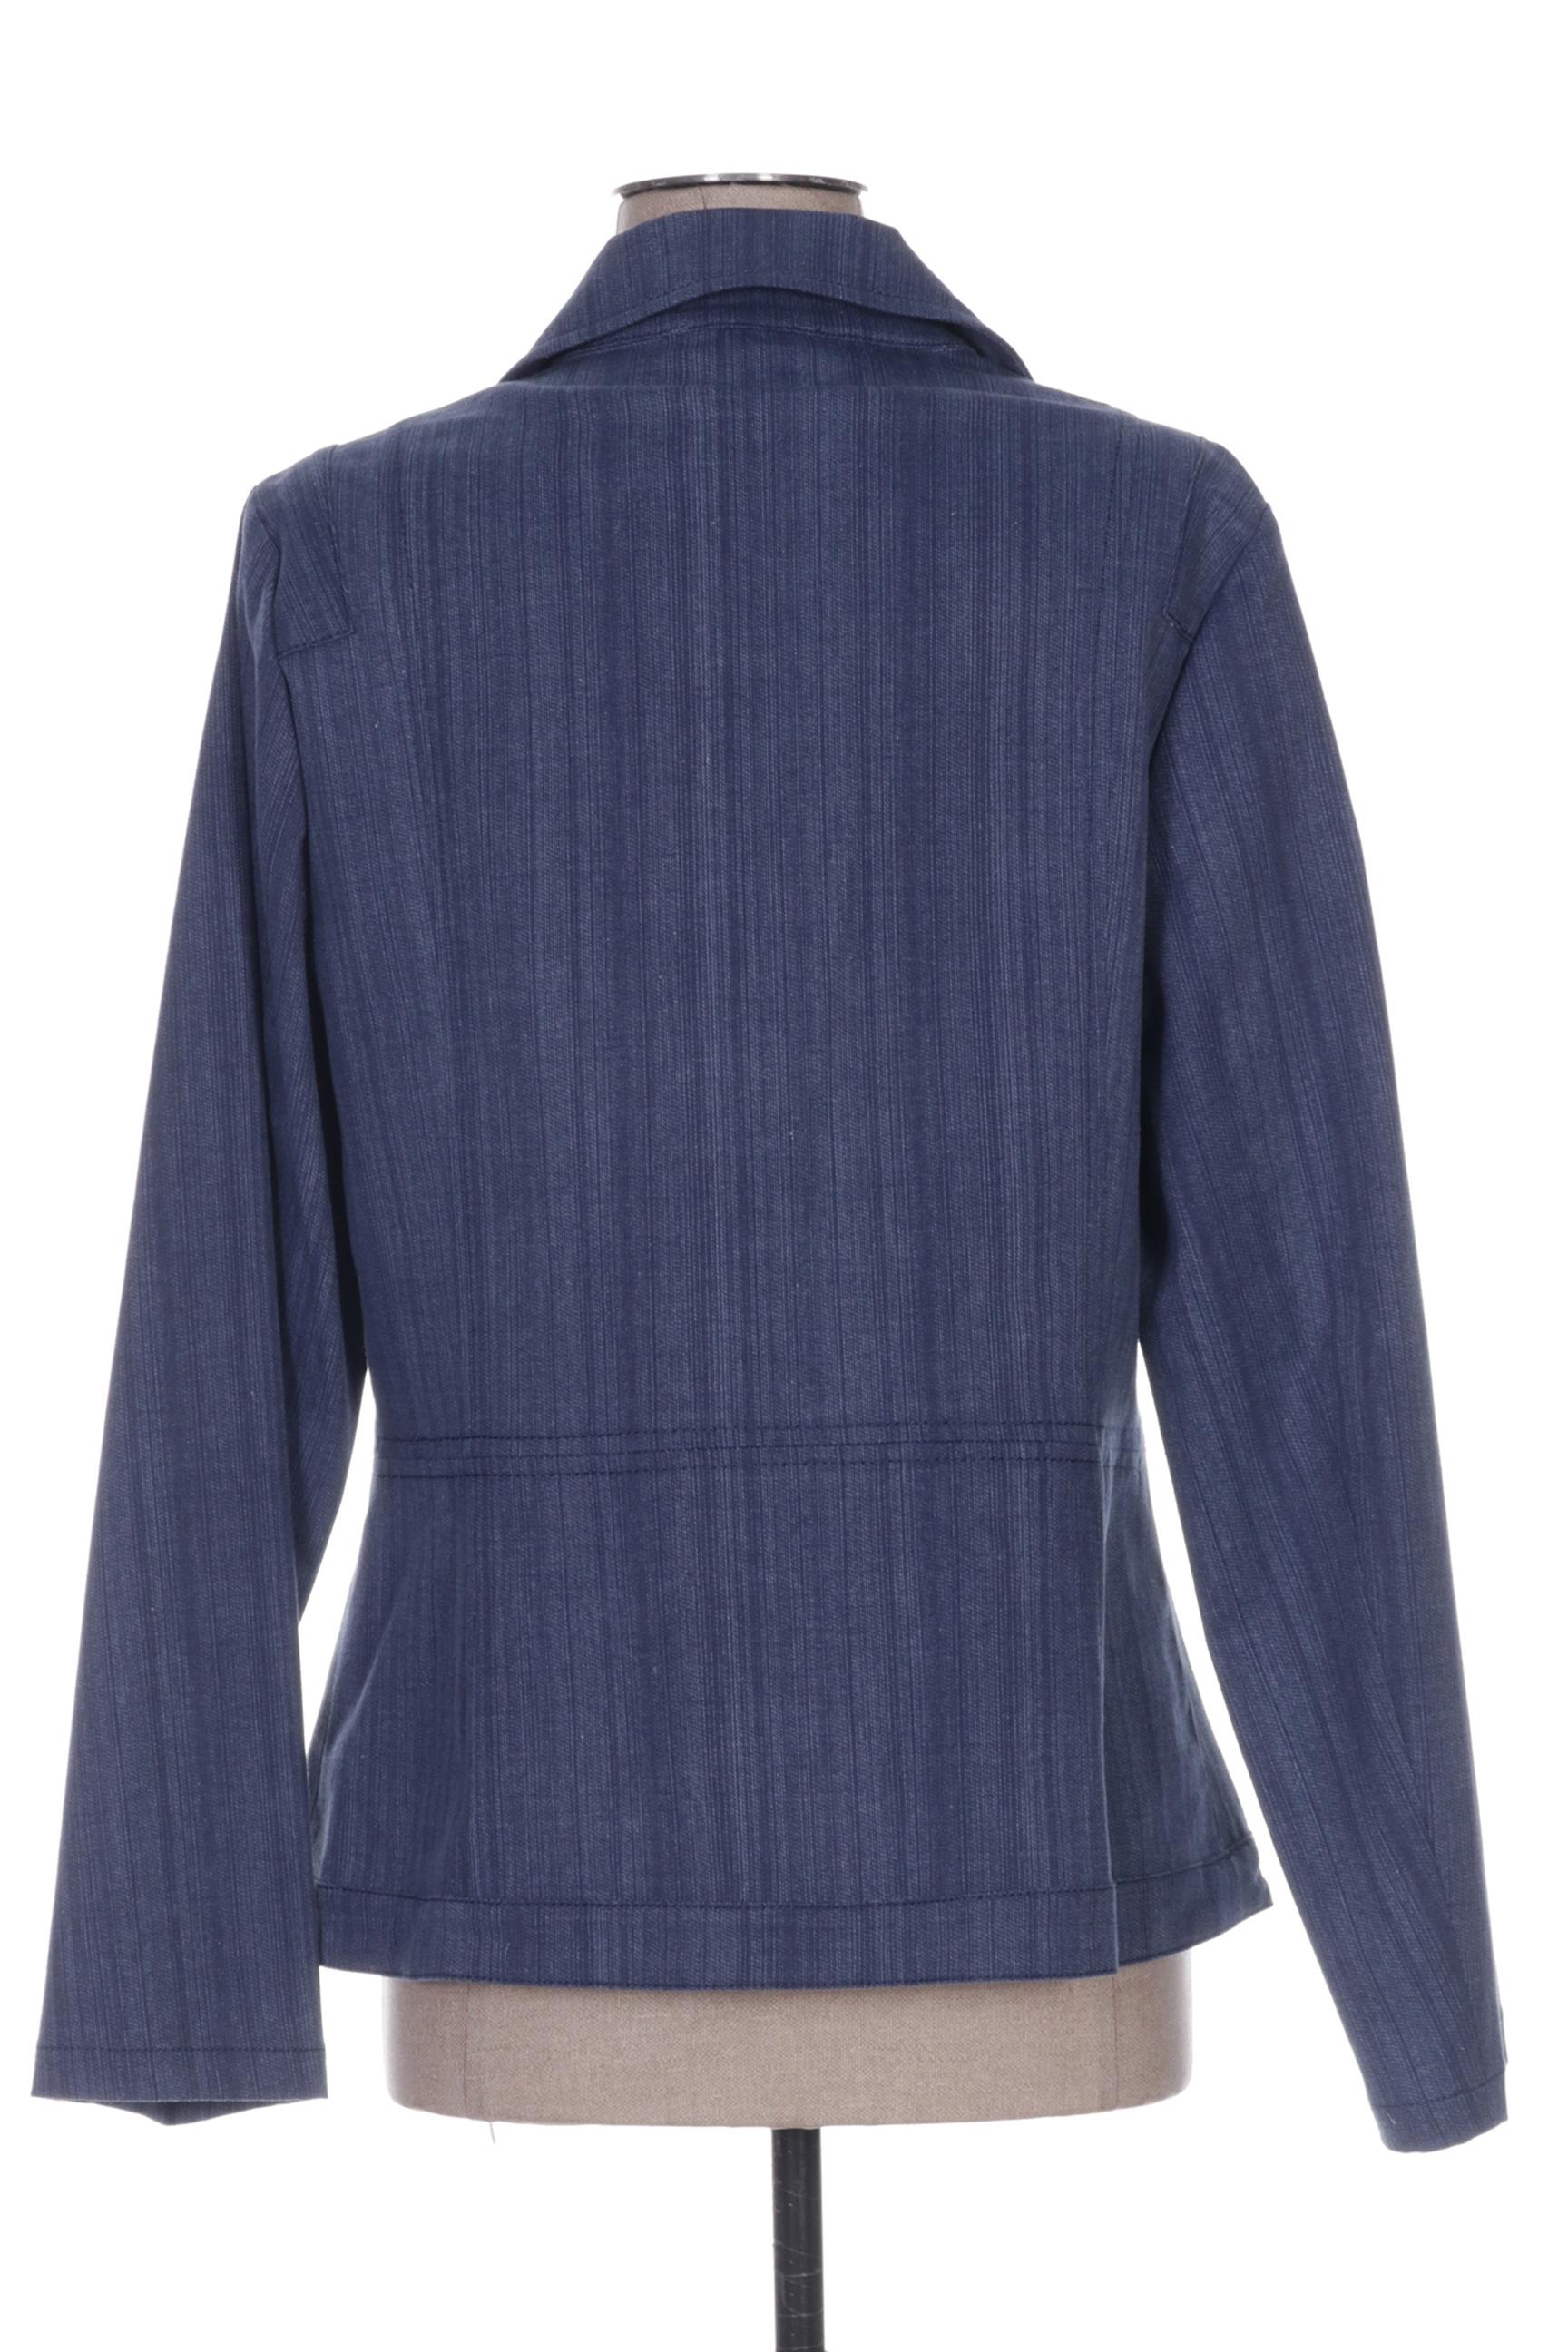 Weinberg Vestesenjean Femme De Couleur Bleu En Soldes Pas Cher 1225912-bleu00